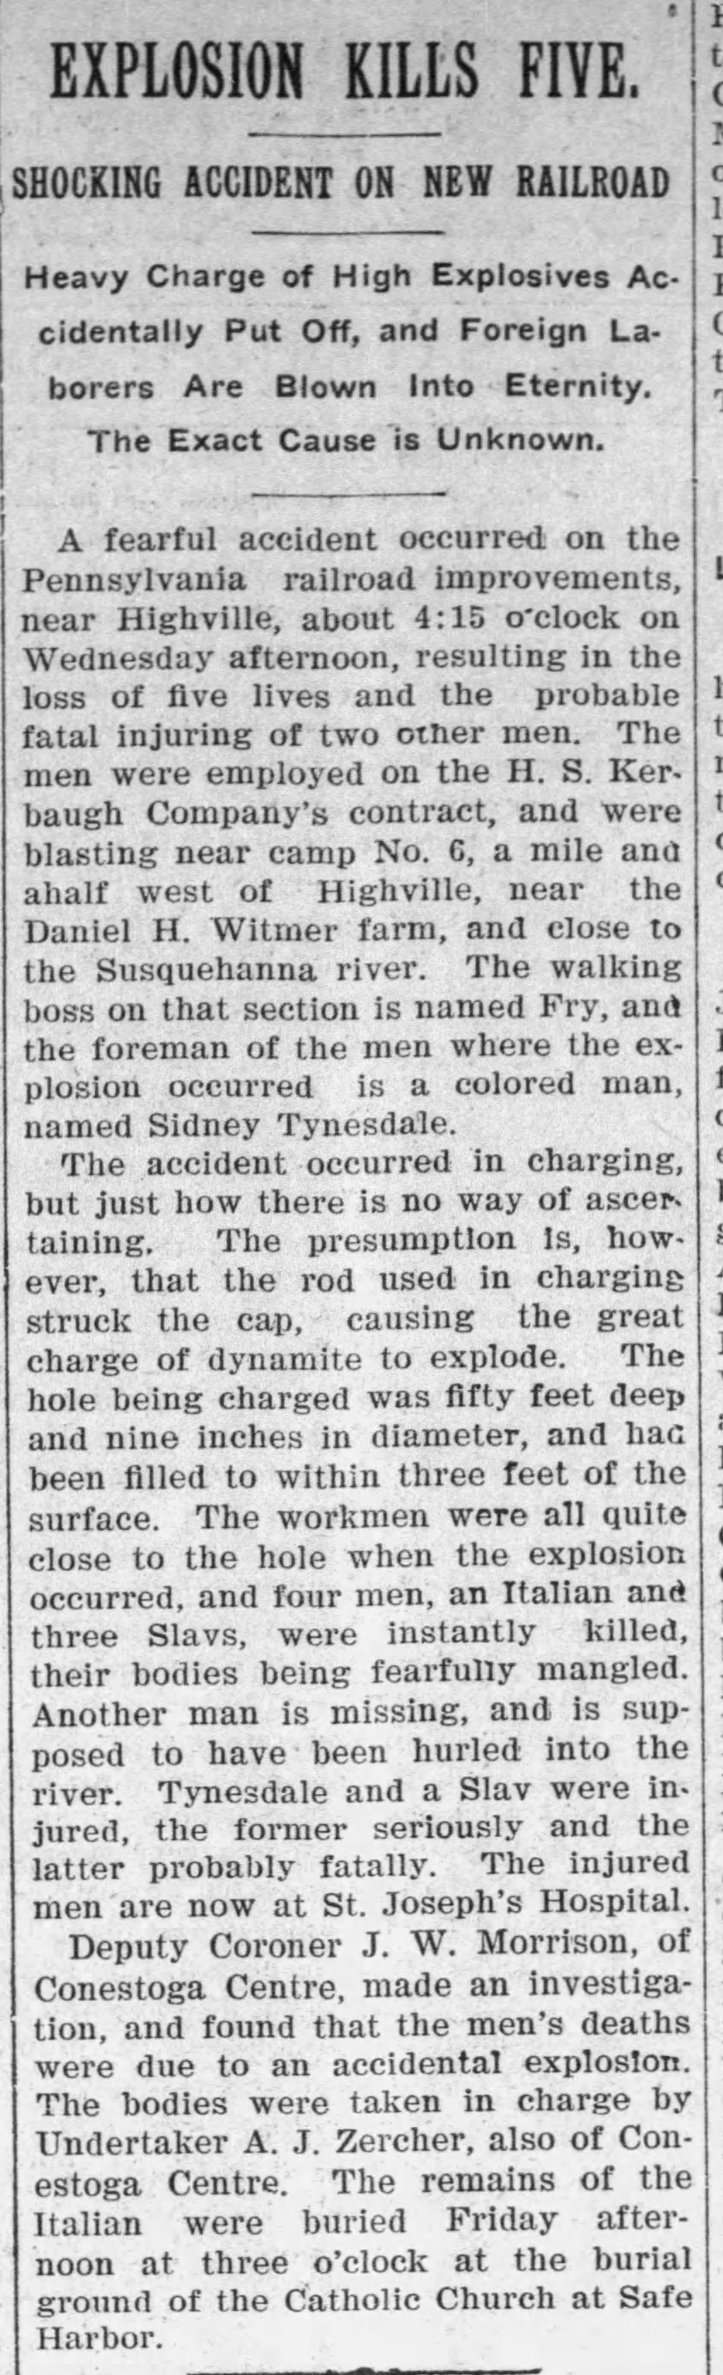 The_Semi_Weekly_New_Era_Sat__Sep_2__1905_article.jpg